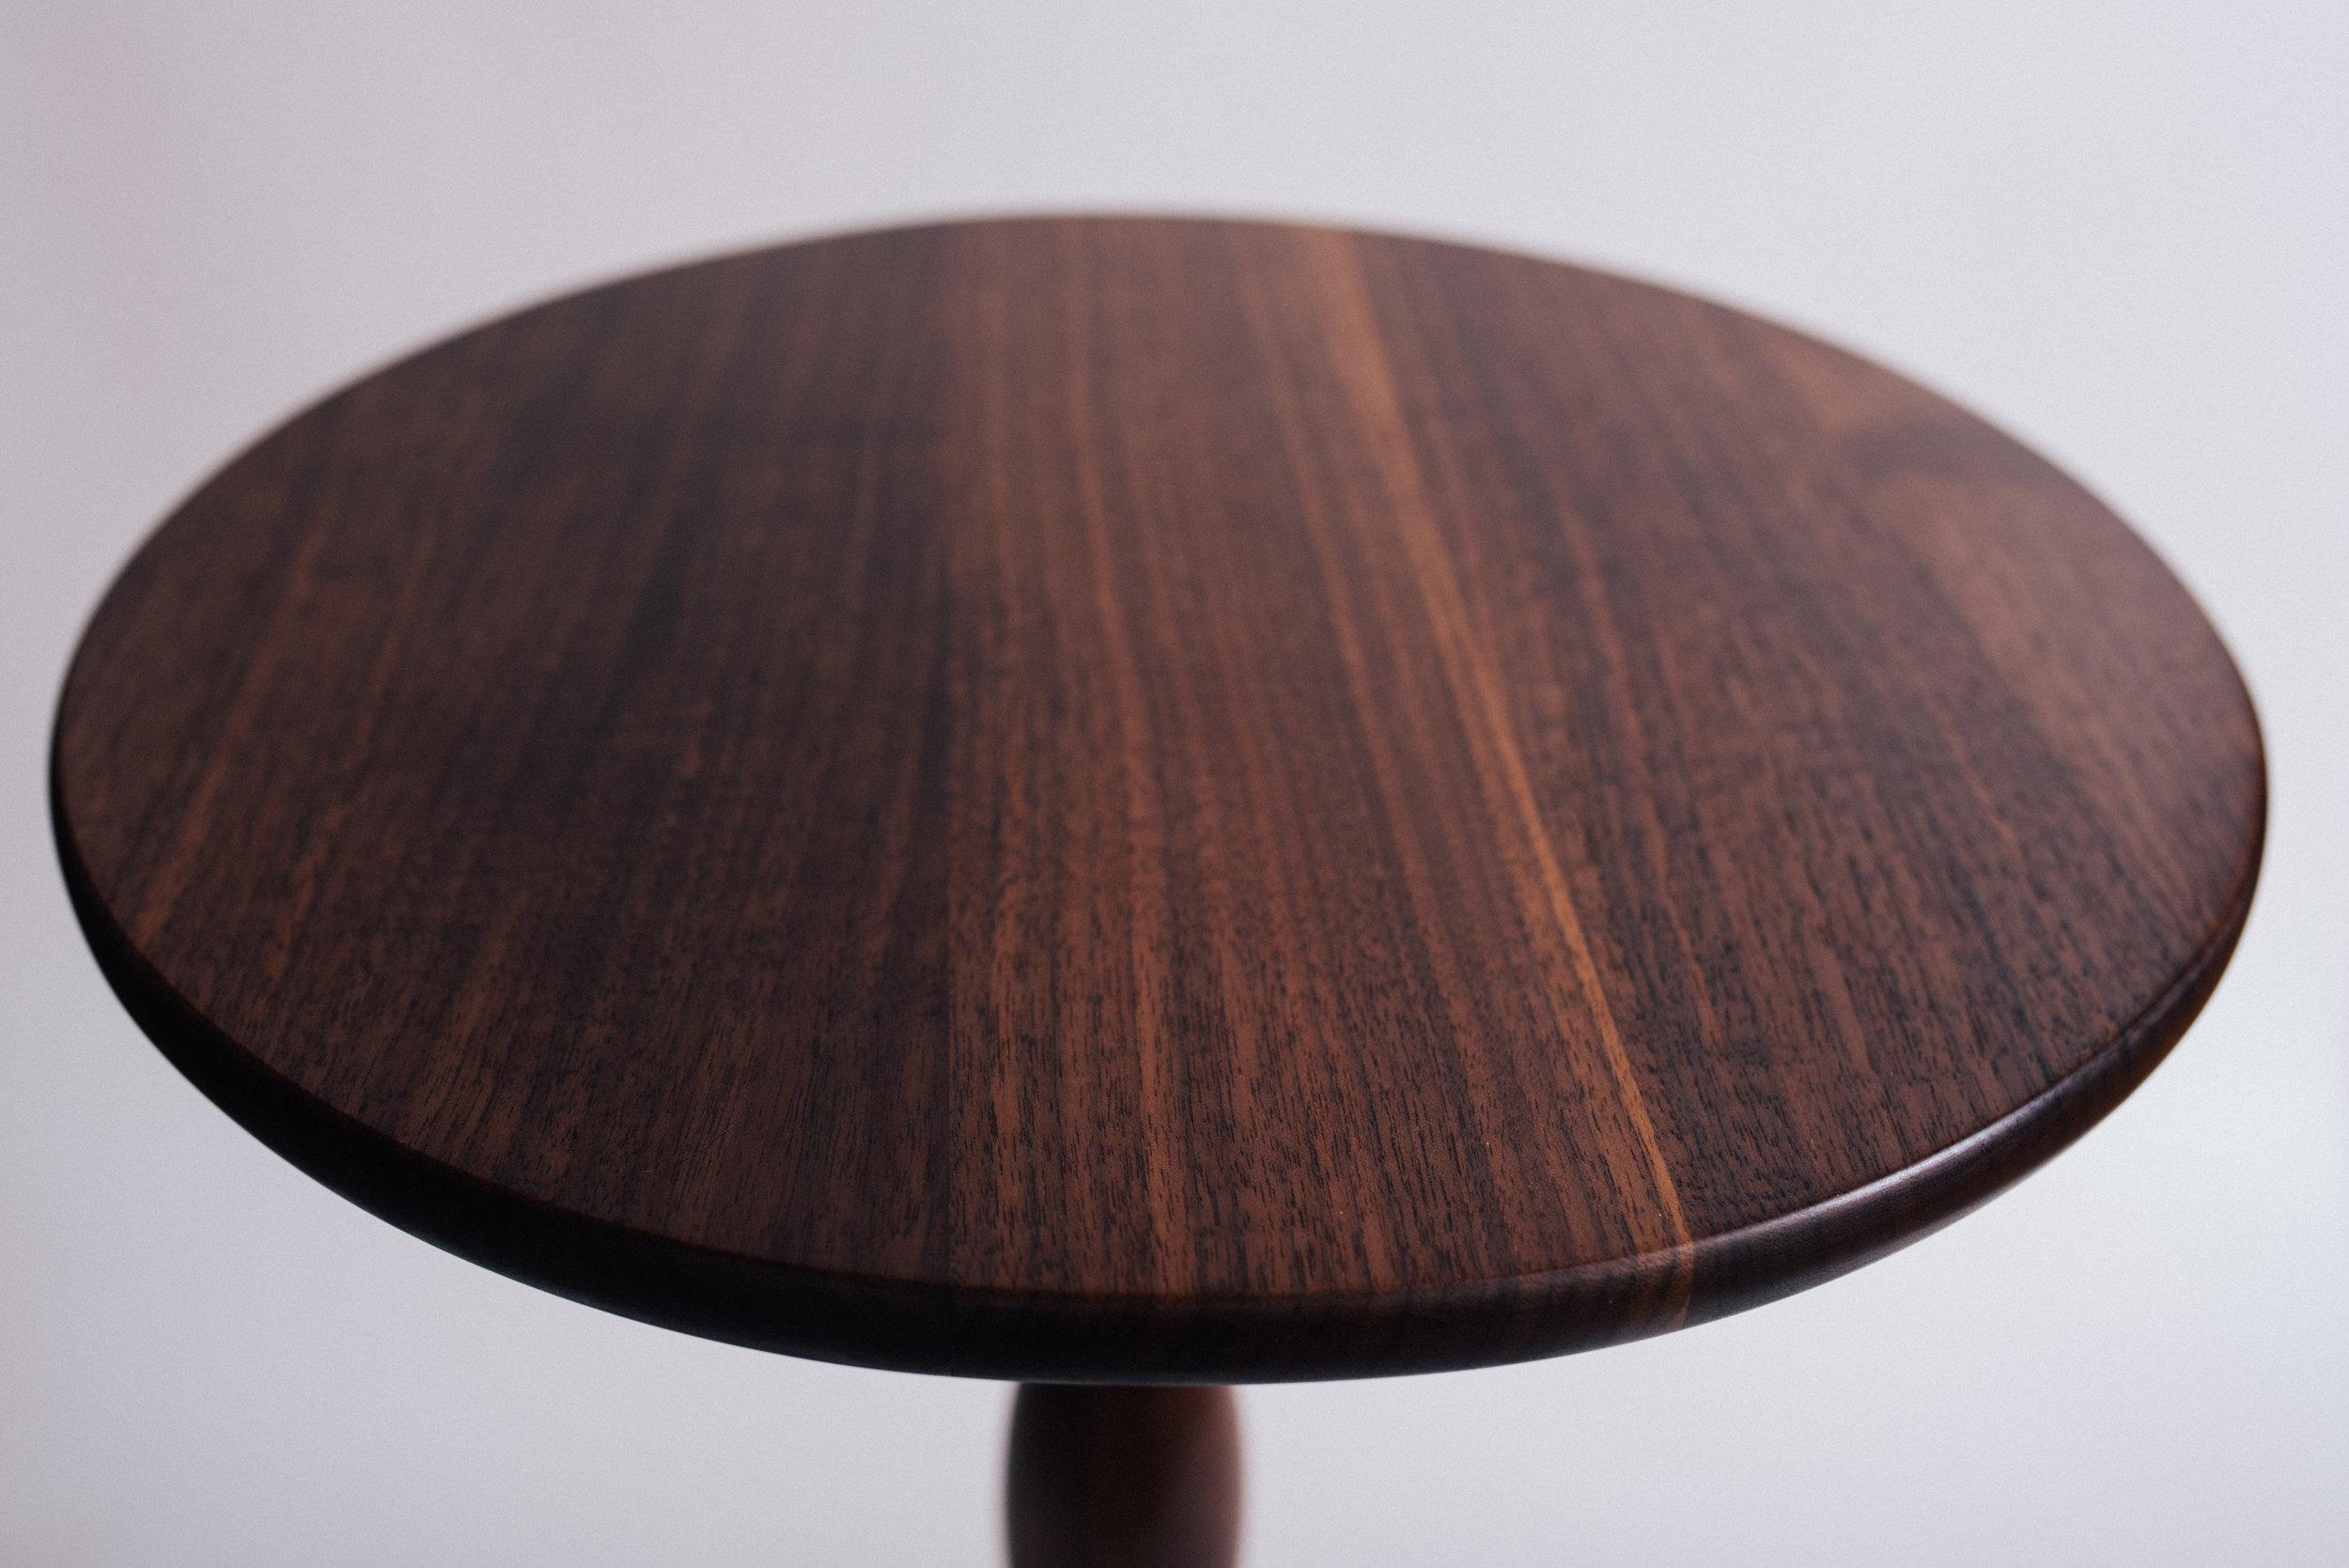 Quarter-sawn black walnut pedestal top